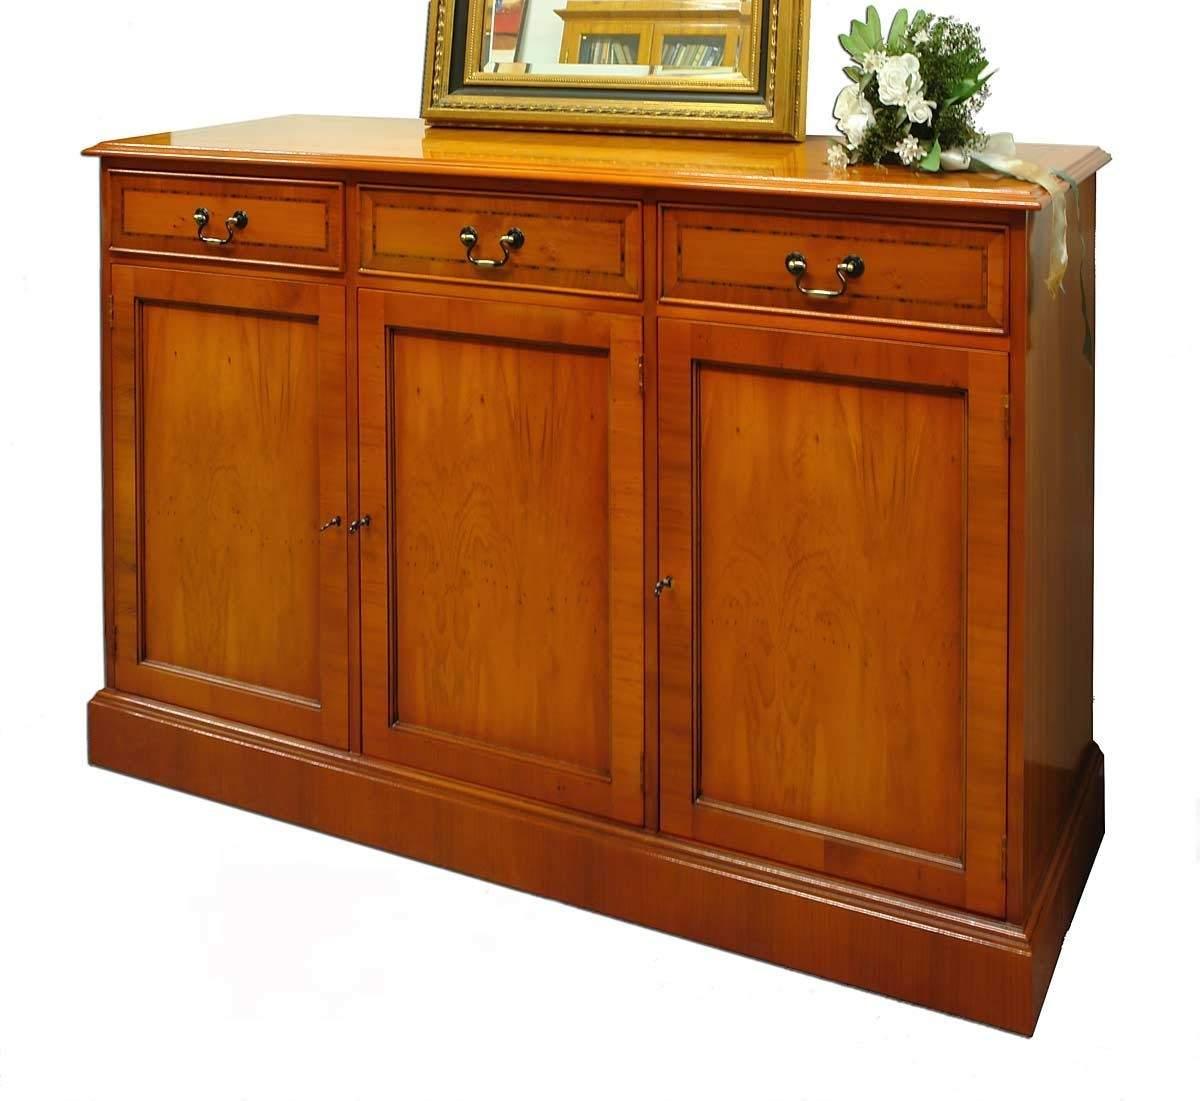 sideboard anrichte kommode aus eibe wie antik 1039 kommoden und anrichten sideboards anrichten. Black Bedroom Furniture Sets. Home Design Ideas